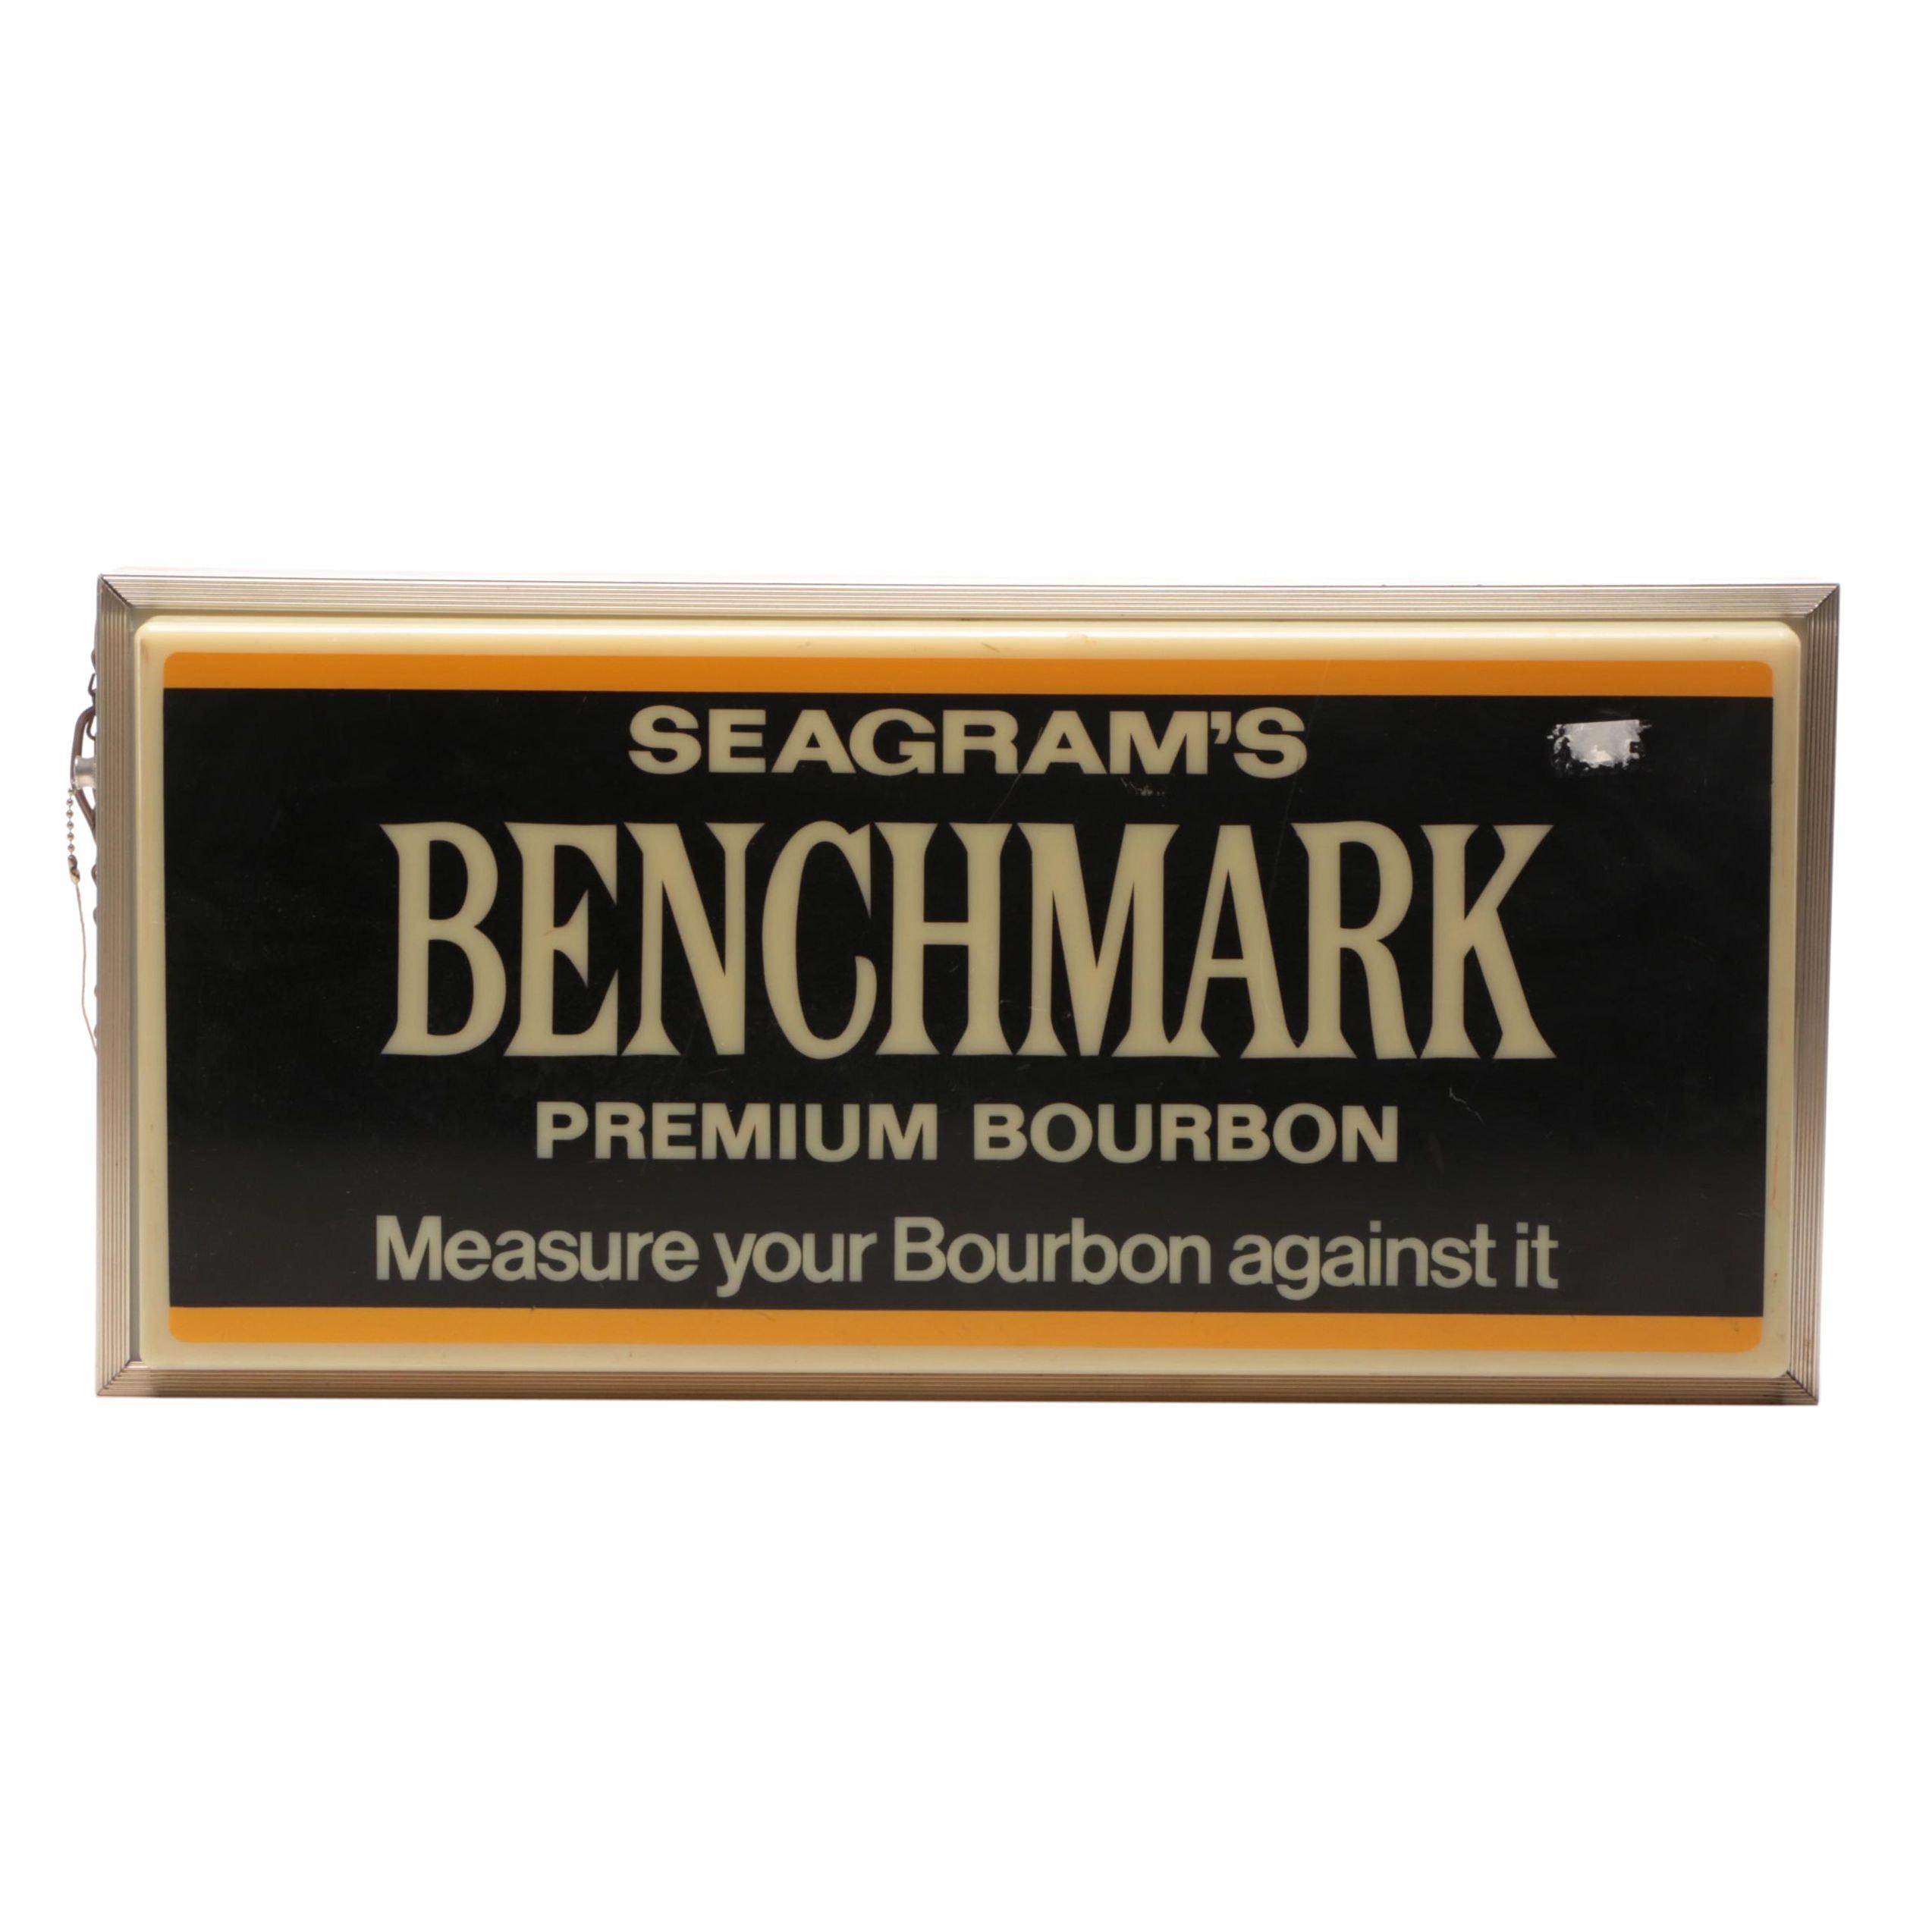 Seagrams's Benchmark Premium Bourbon Illuminated Electric Advertising Sign